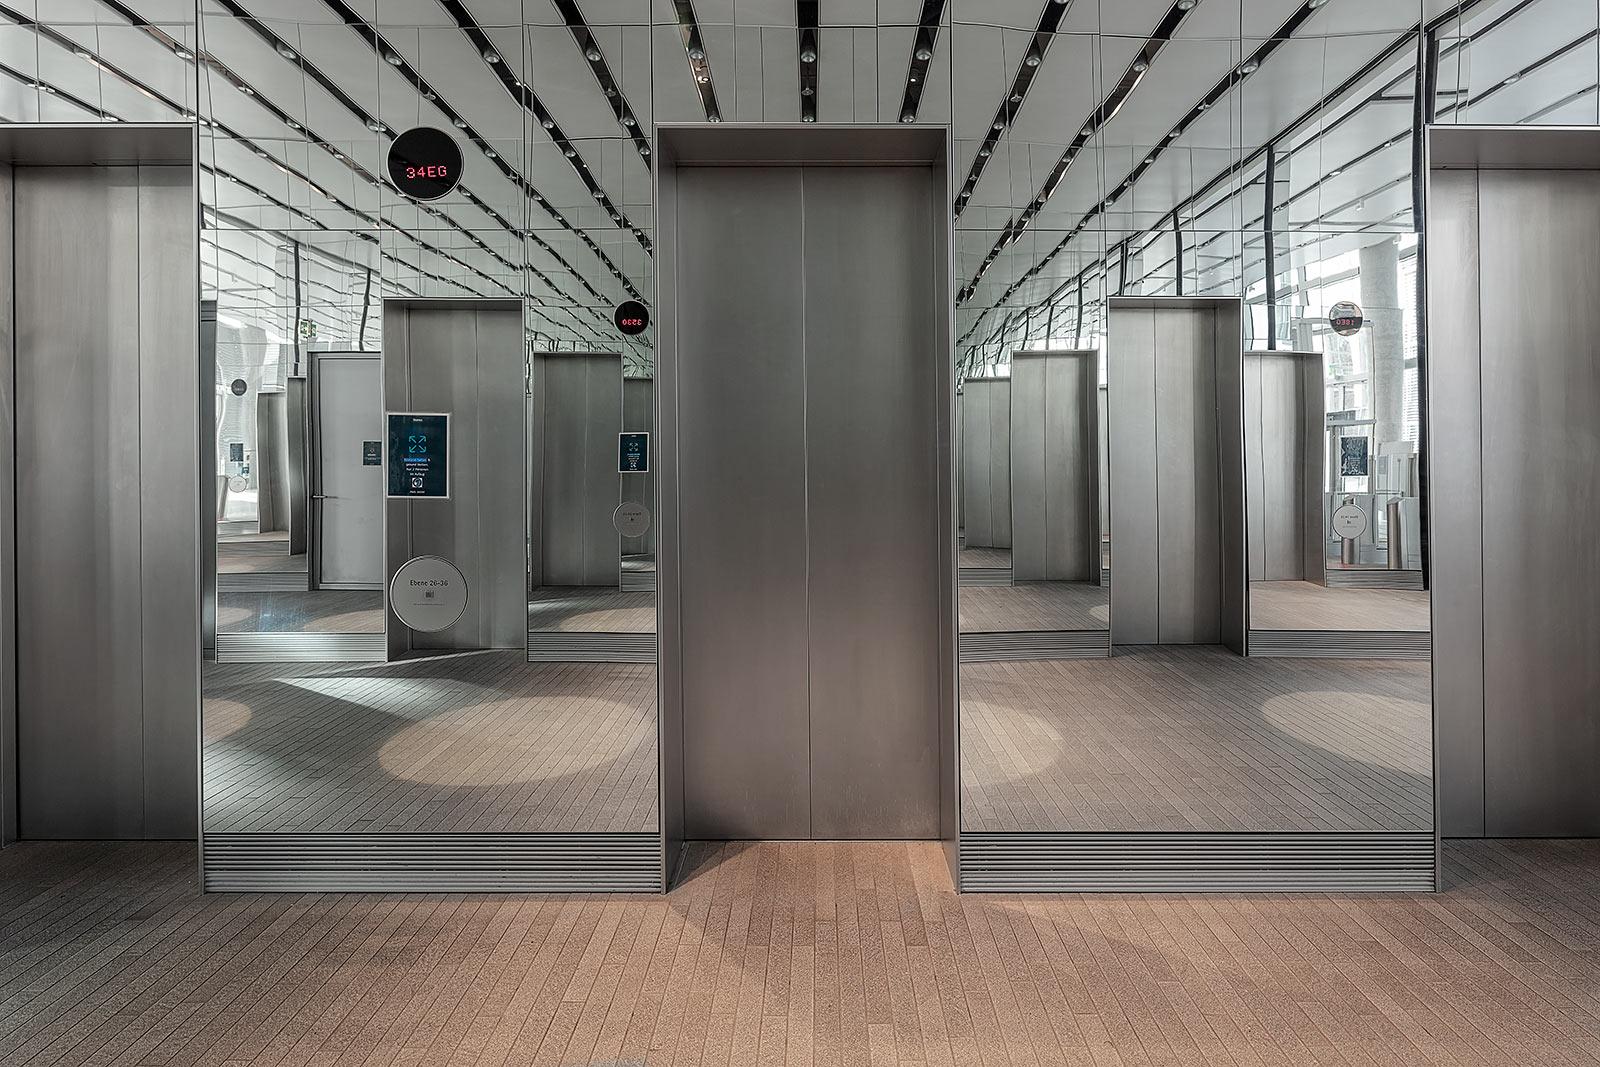 Architektur-Fotos-Gabriel-Buechelmeier